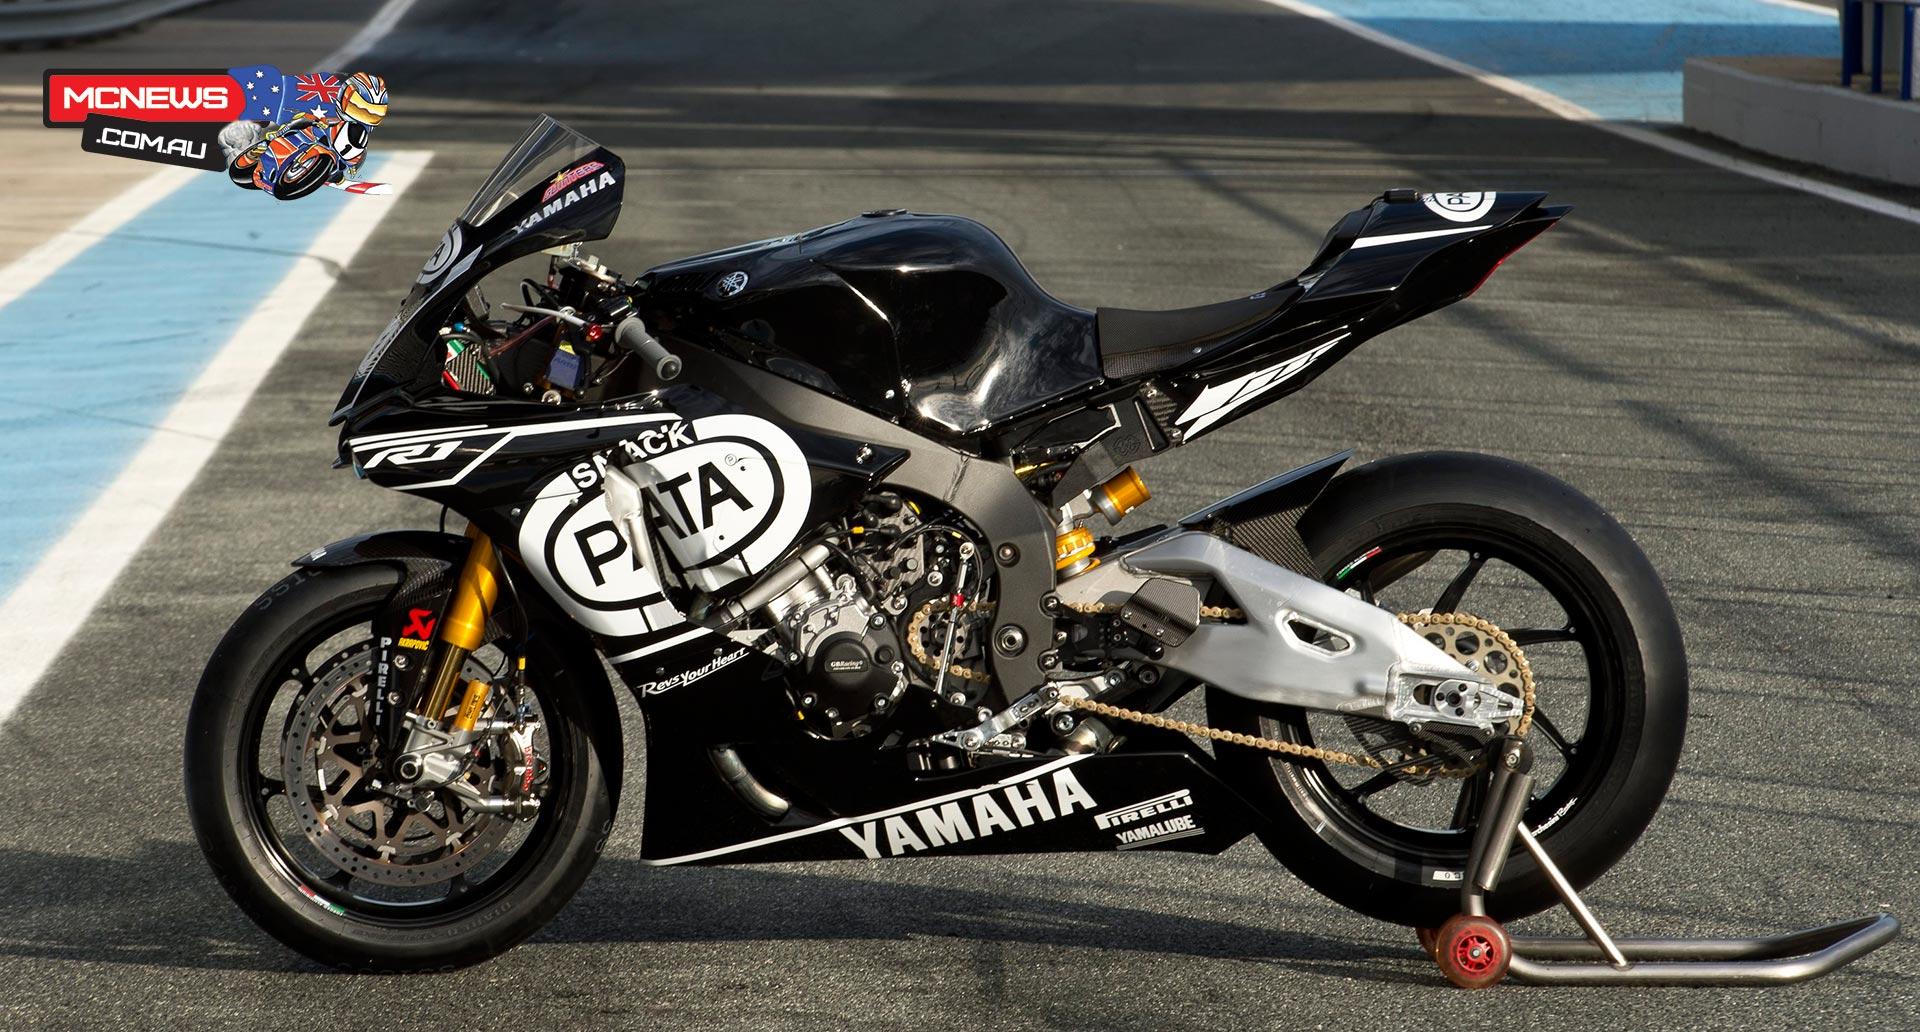 http://www.mcnews.com.au/wp-content/uploads/2015/11/WorldSBK-2016-Test-Nov-Jerez-Yamaha.jpg